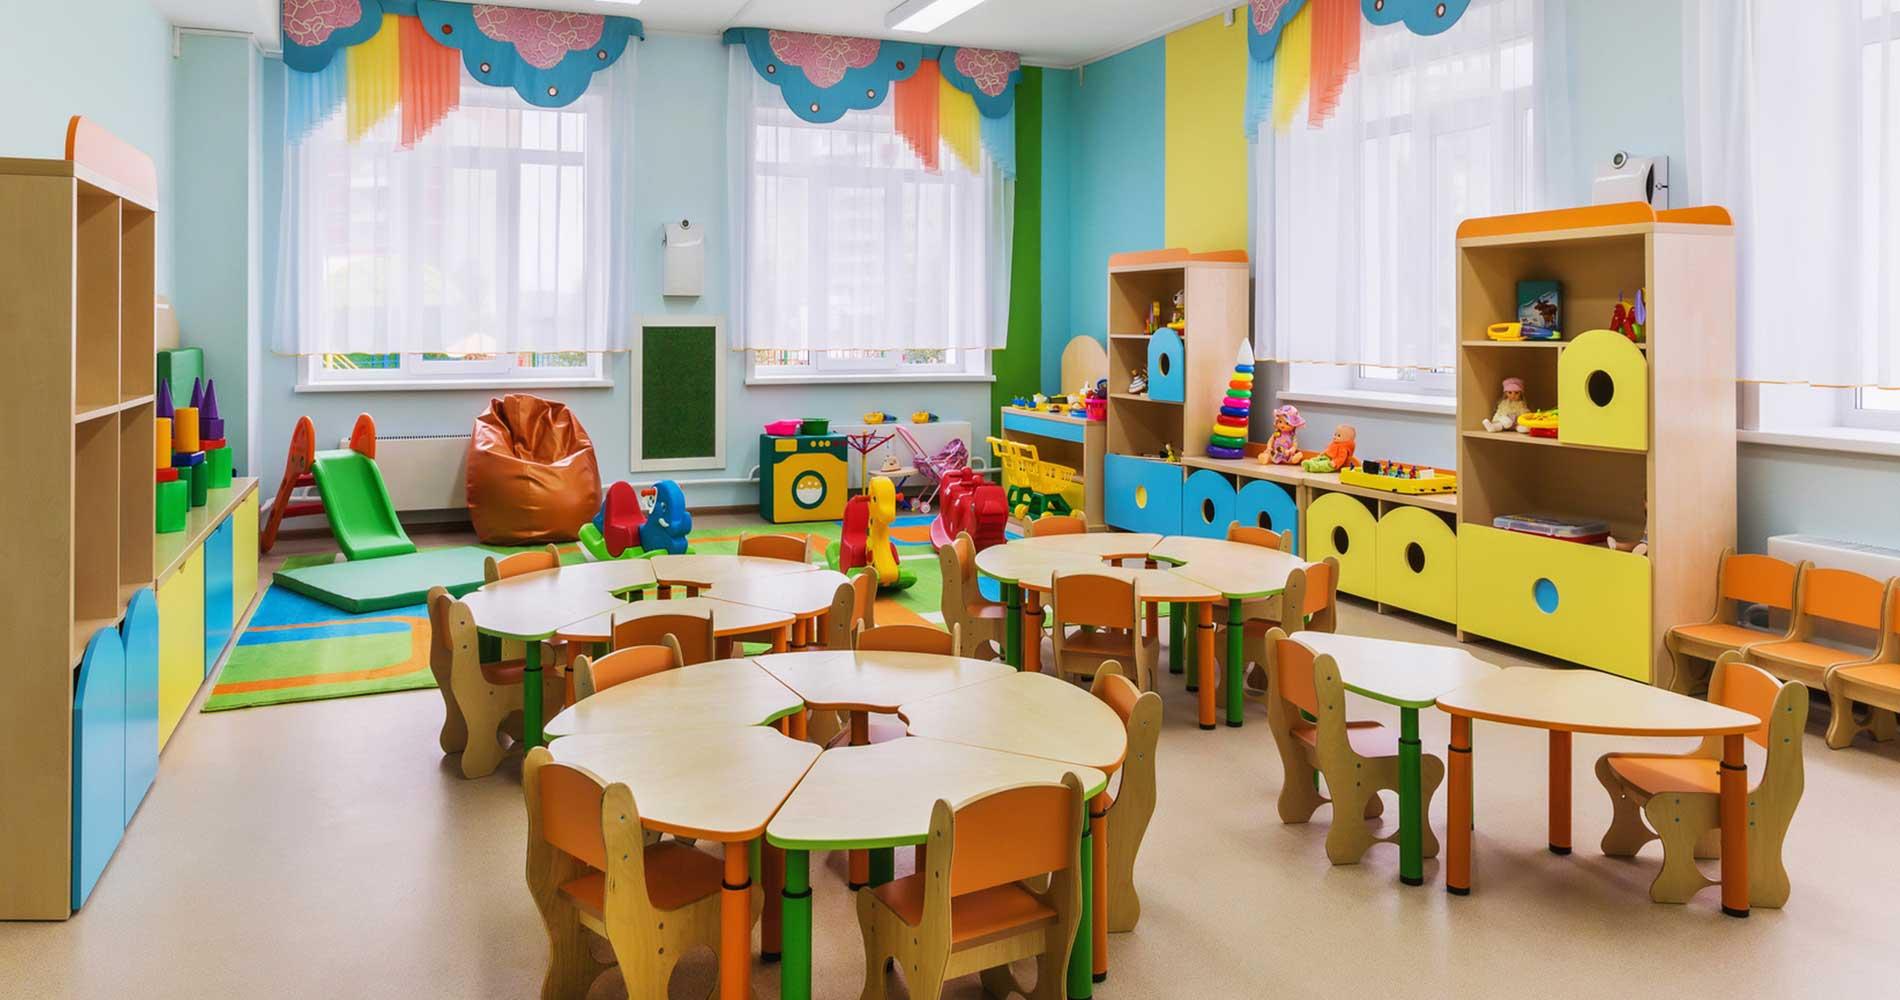 consultora de material educativo de centros de educacion ybea group